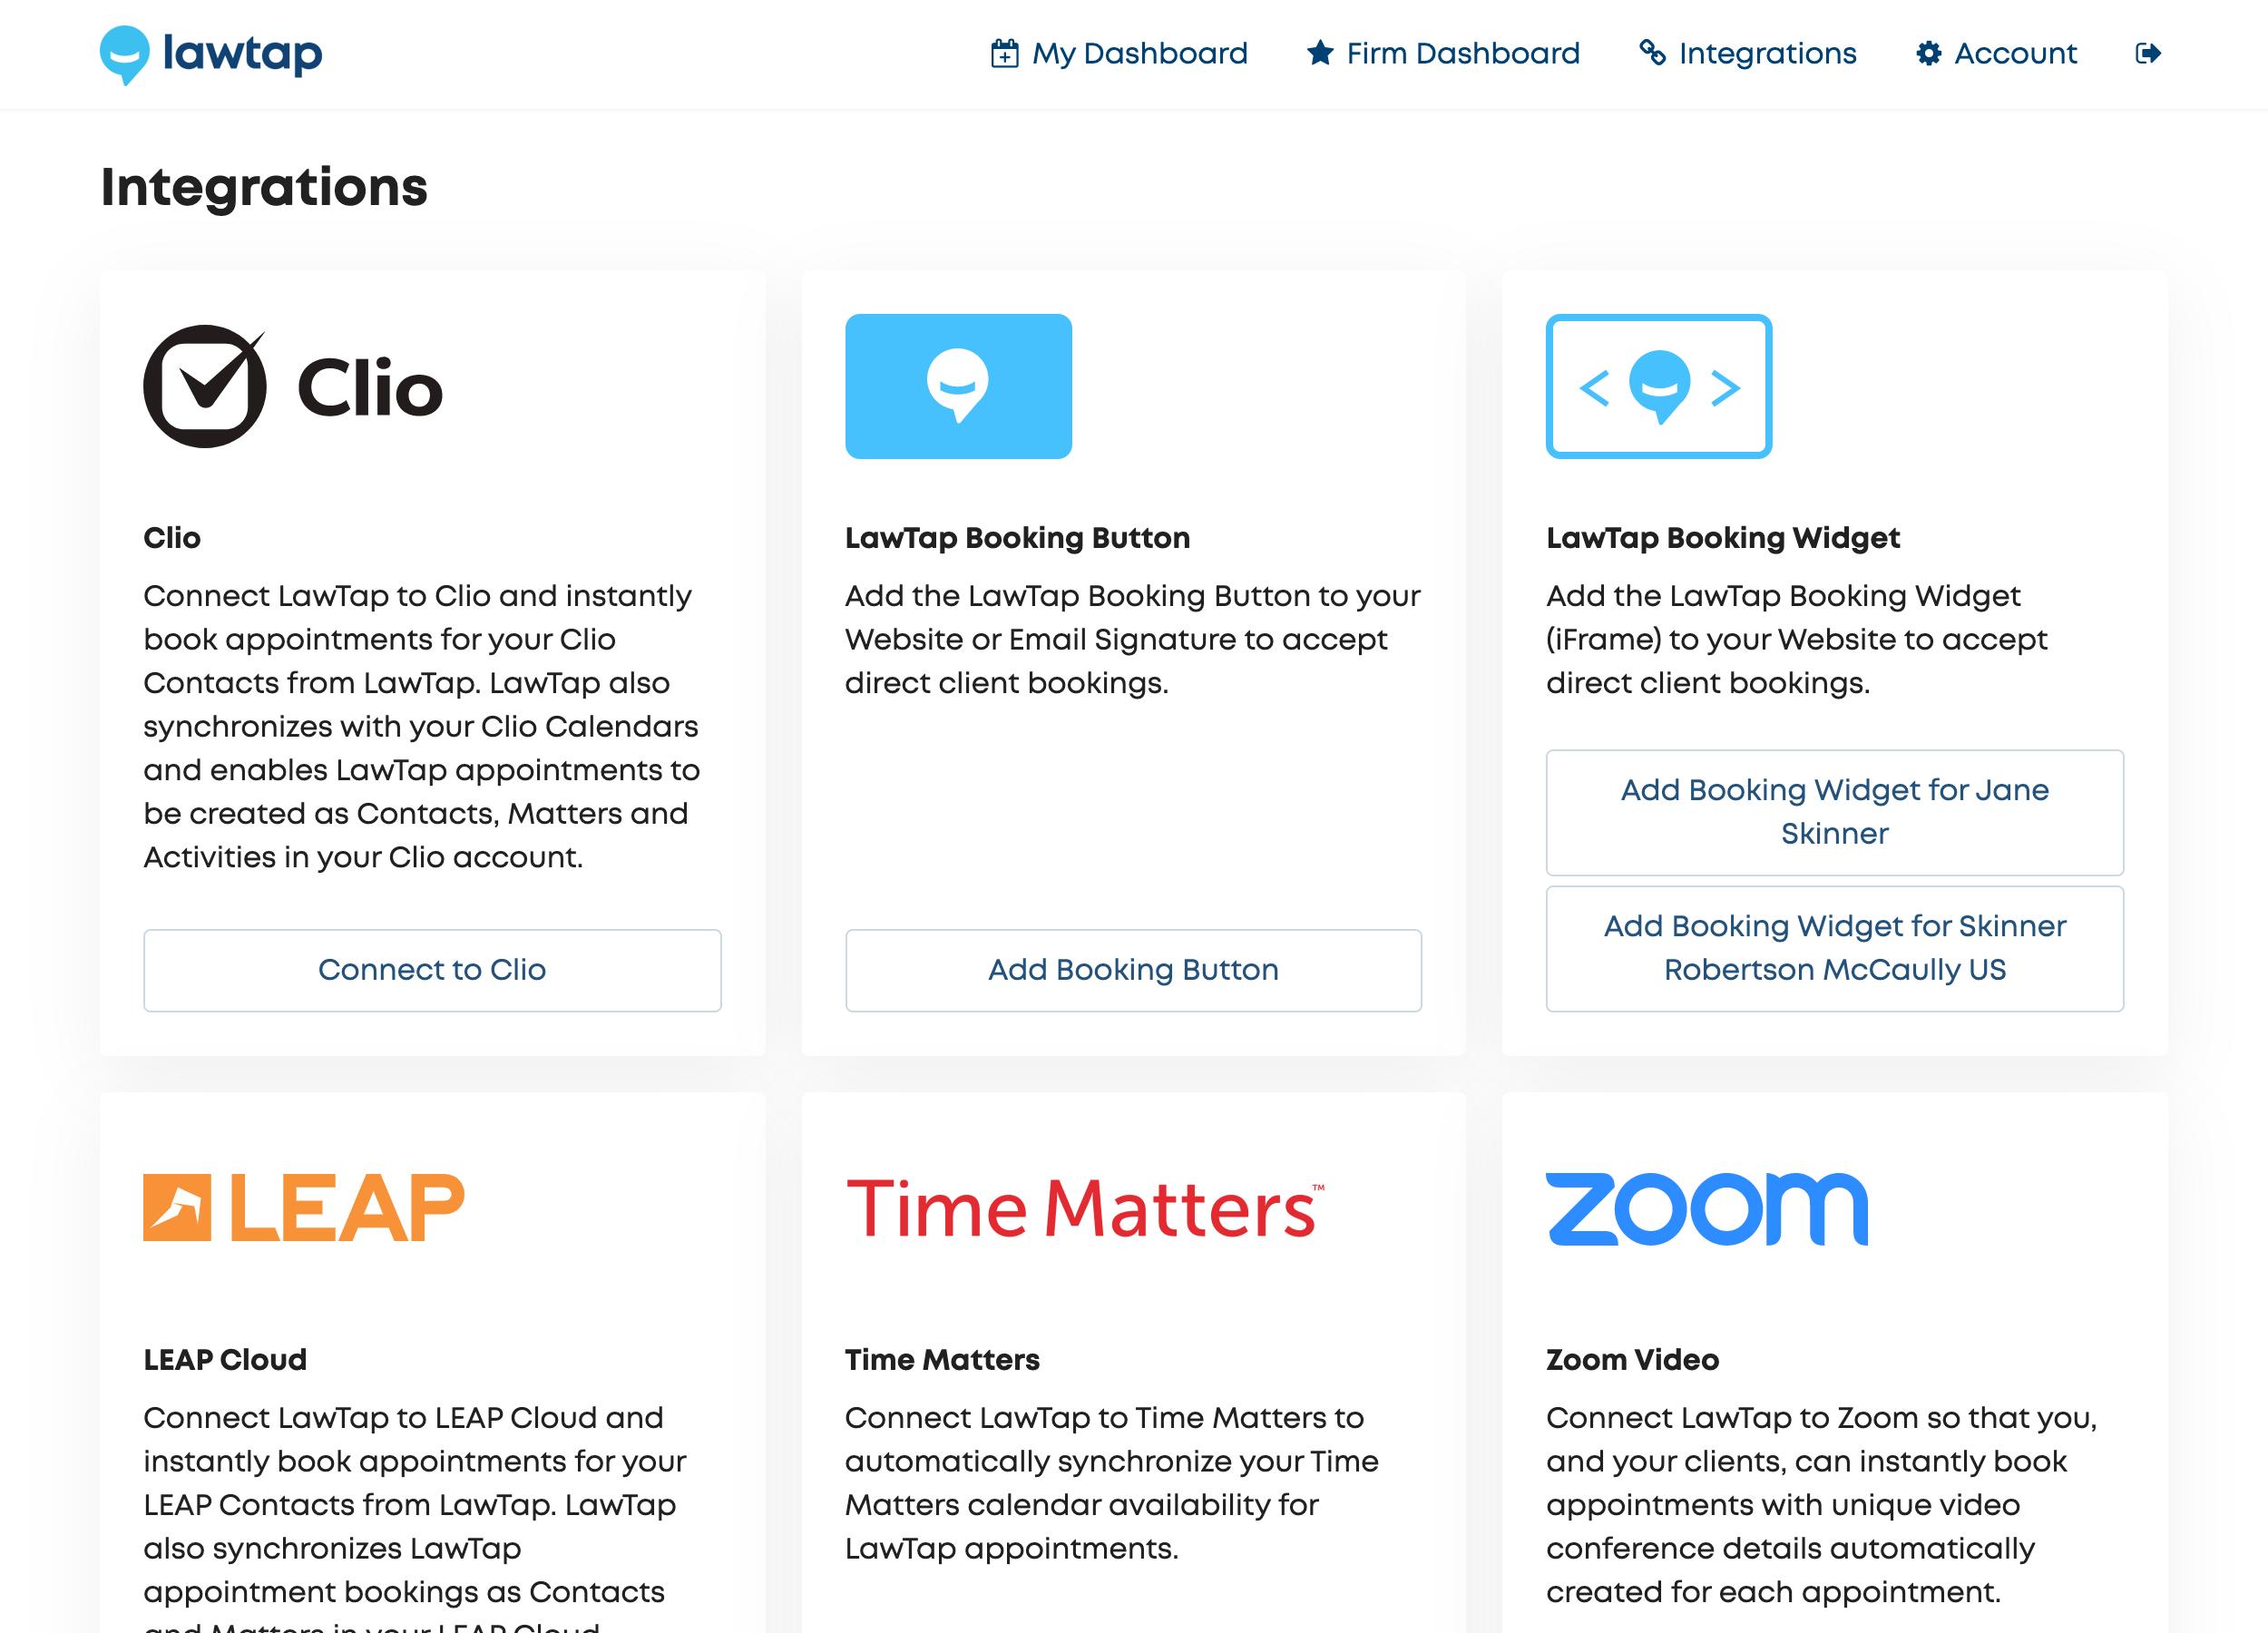 LawTap Screenshot - Integrations